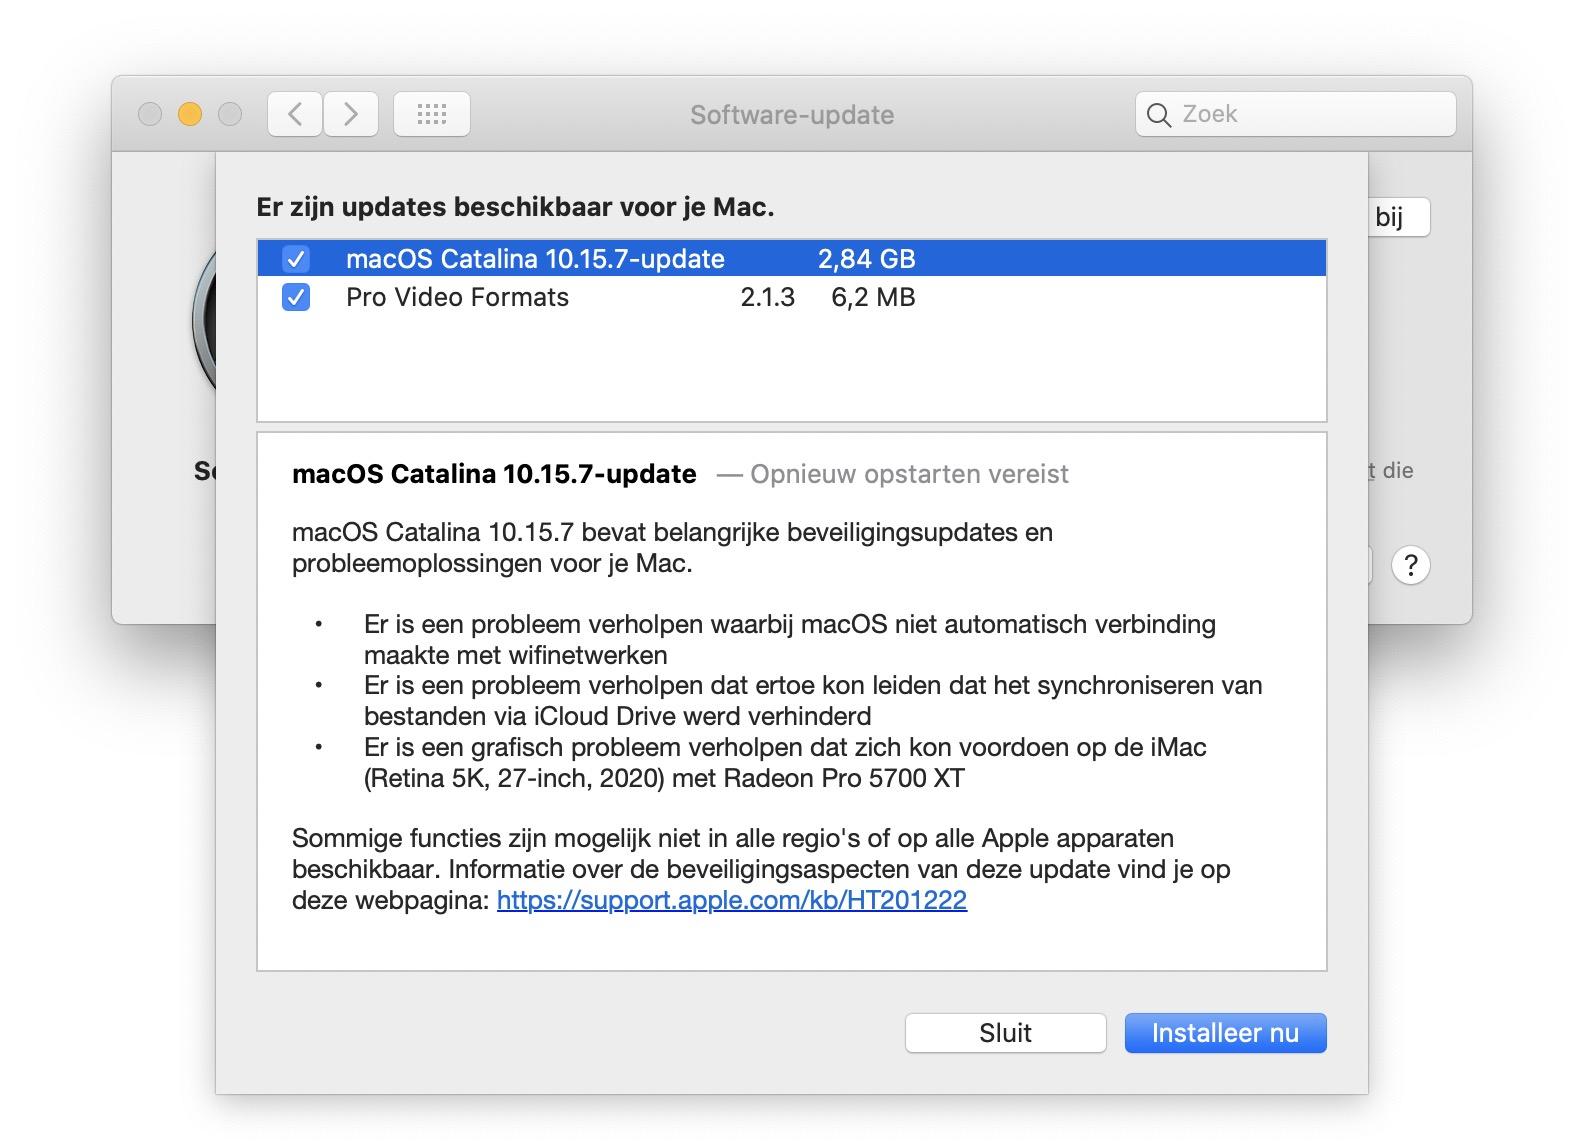 https://www.macfreak.nl/modules/news/images/zArt.Catalina10.15.7ReleaseNotes.jpg